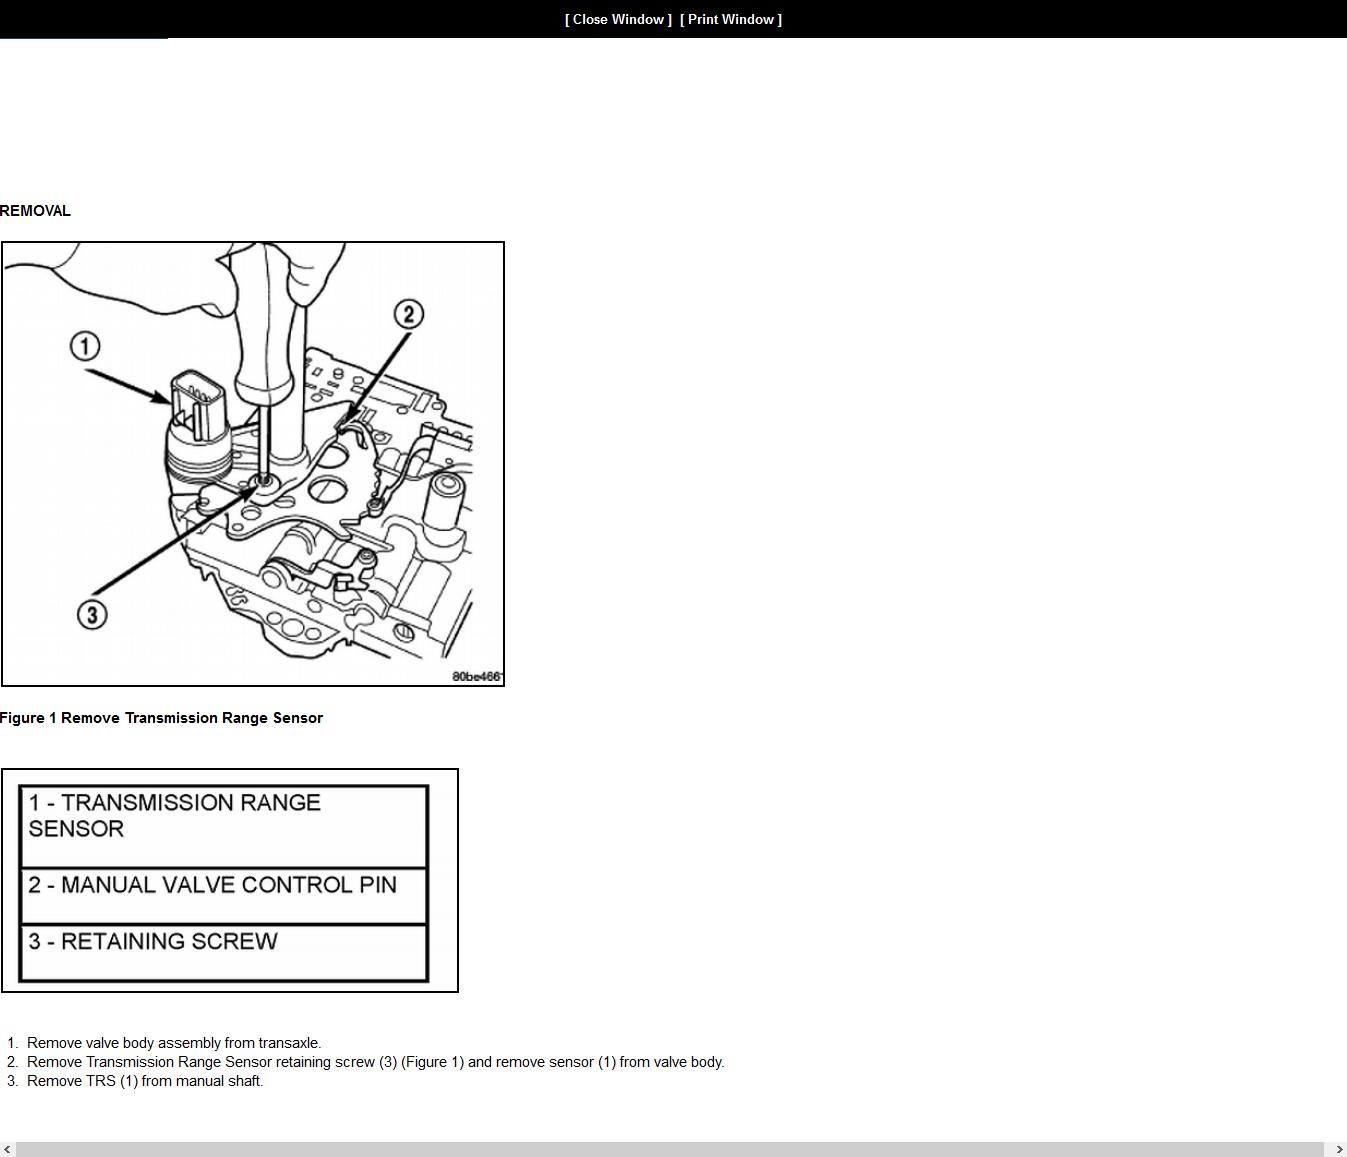 2003 Dodge Caravan Wiring Diagram Chrysler Neutral Safety ... on